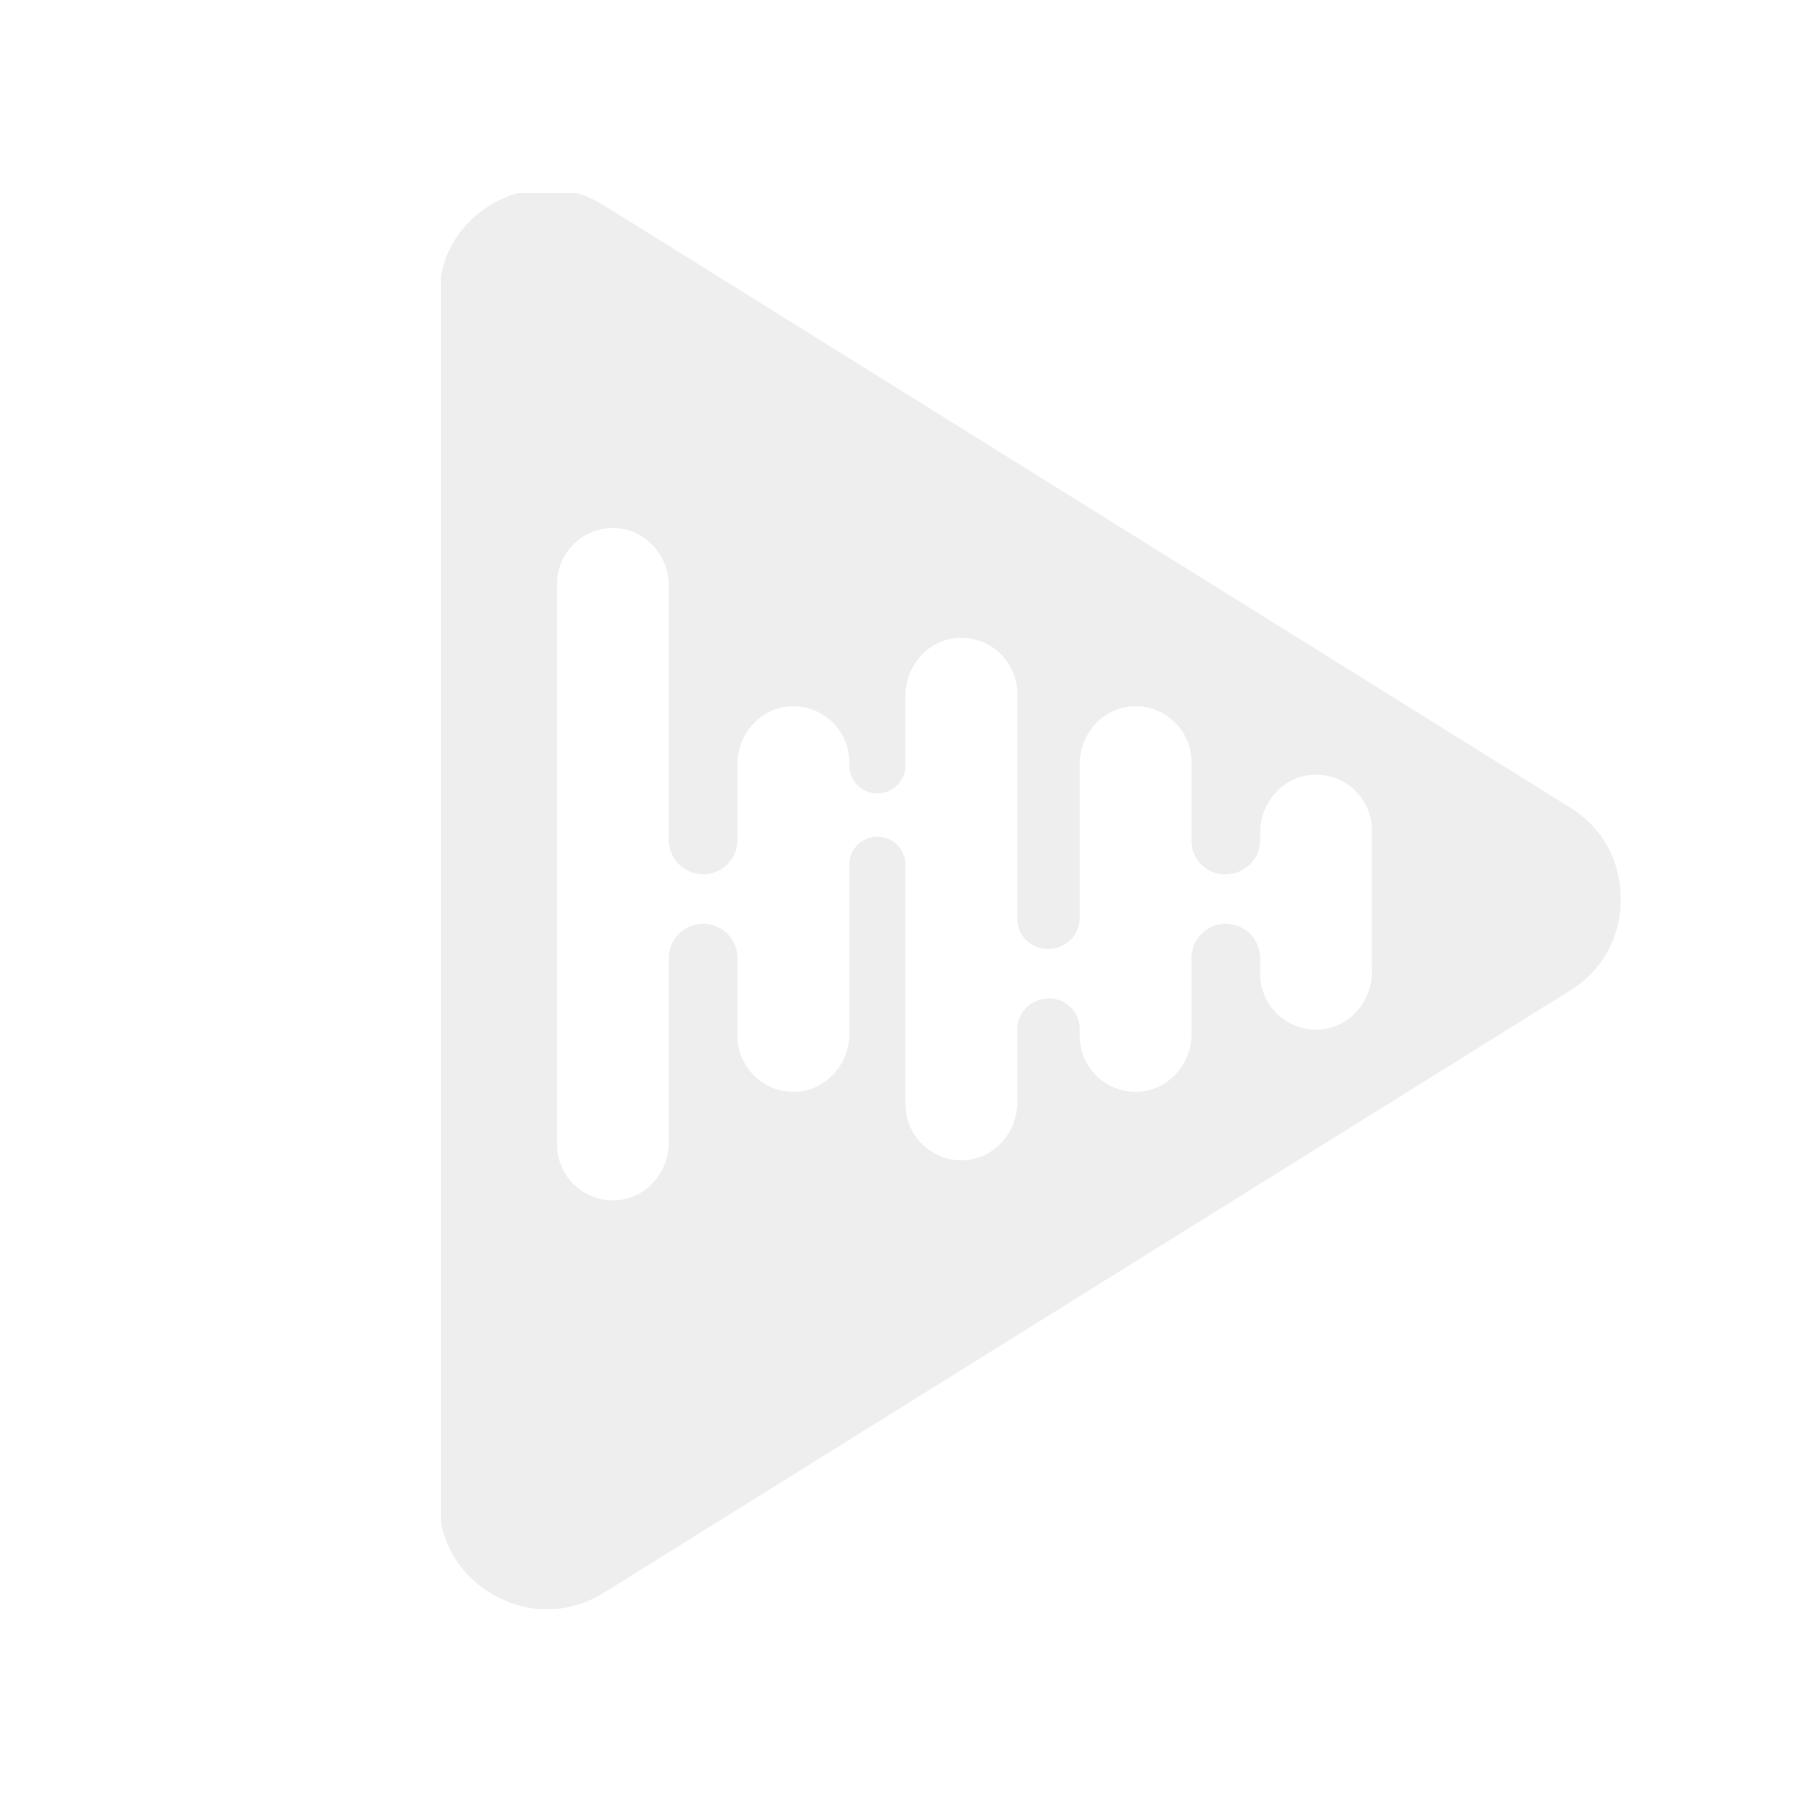 Audison APBMW-F46-HIFI